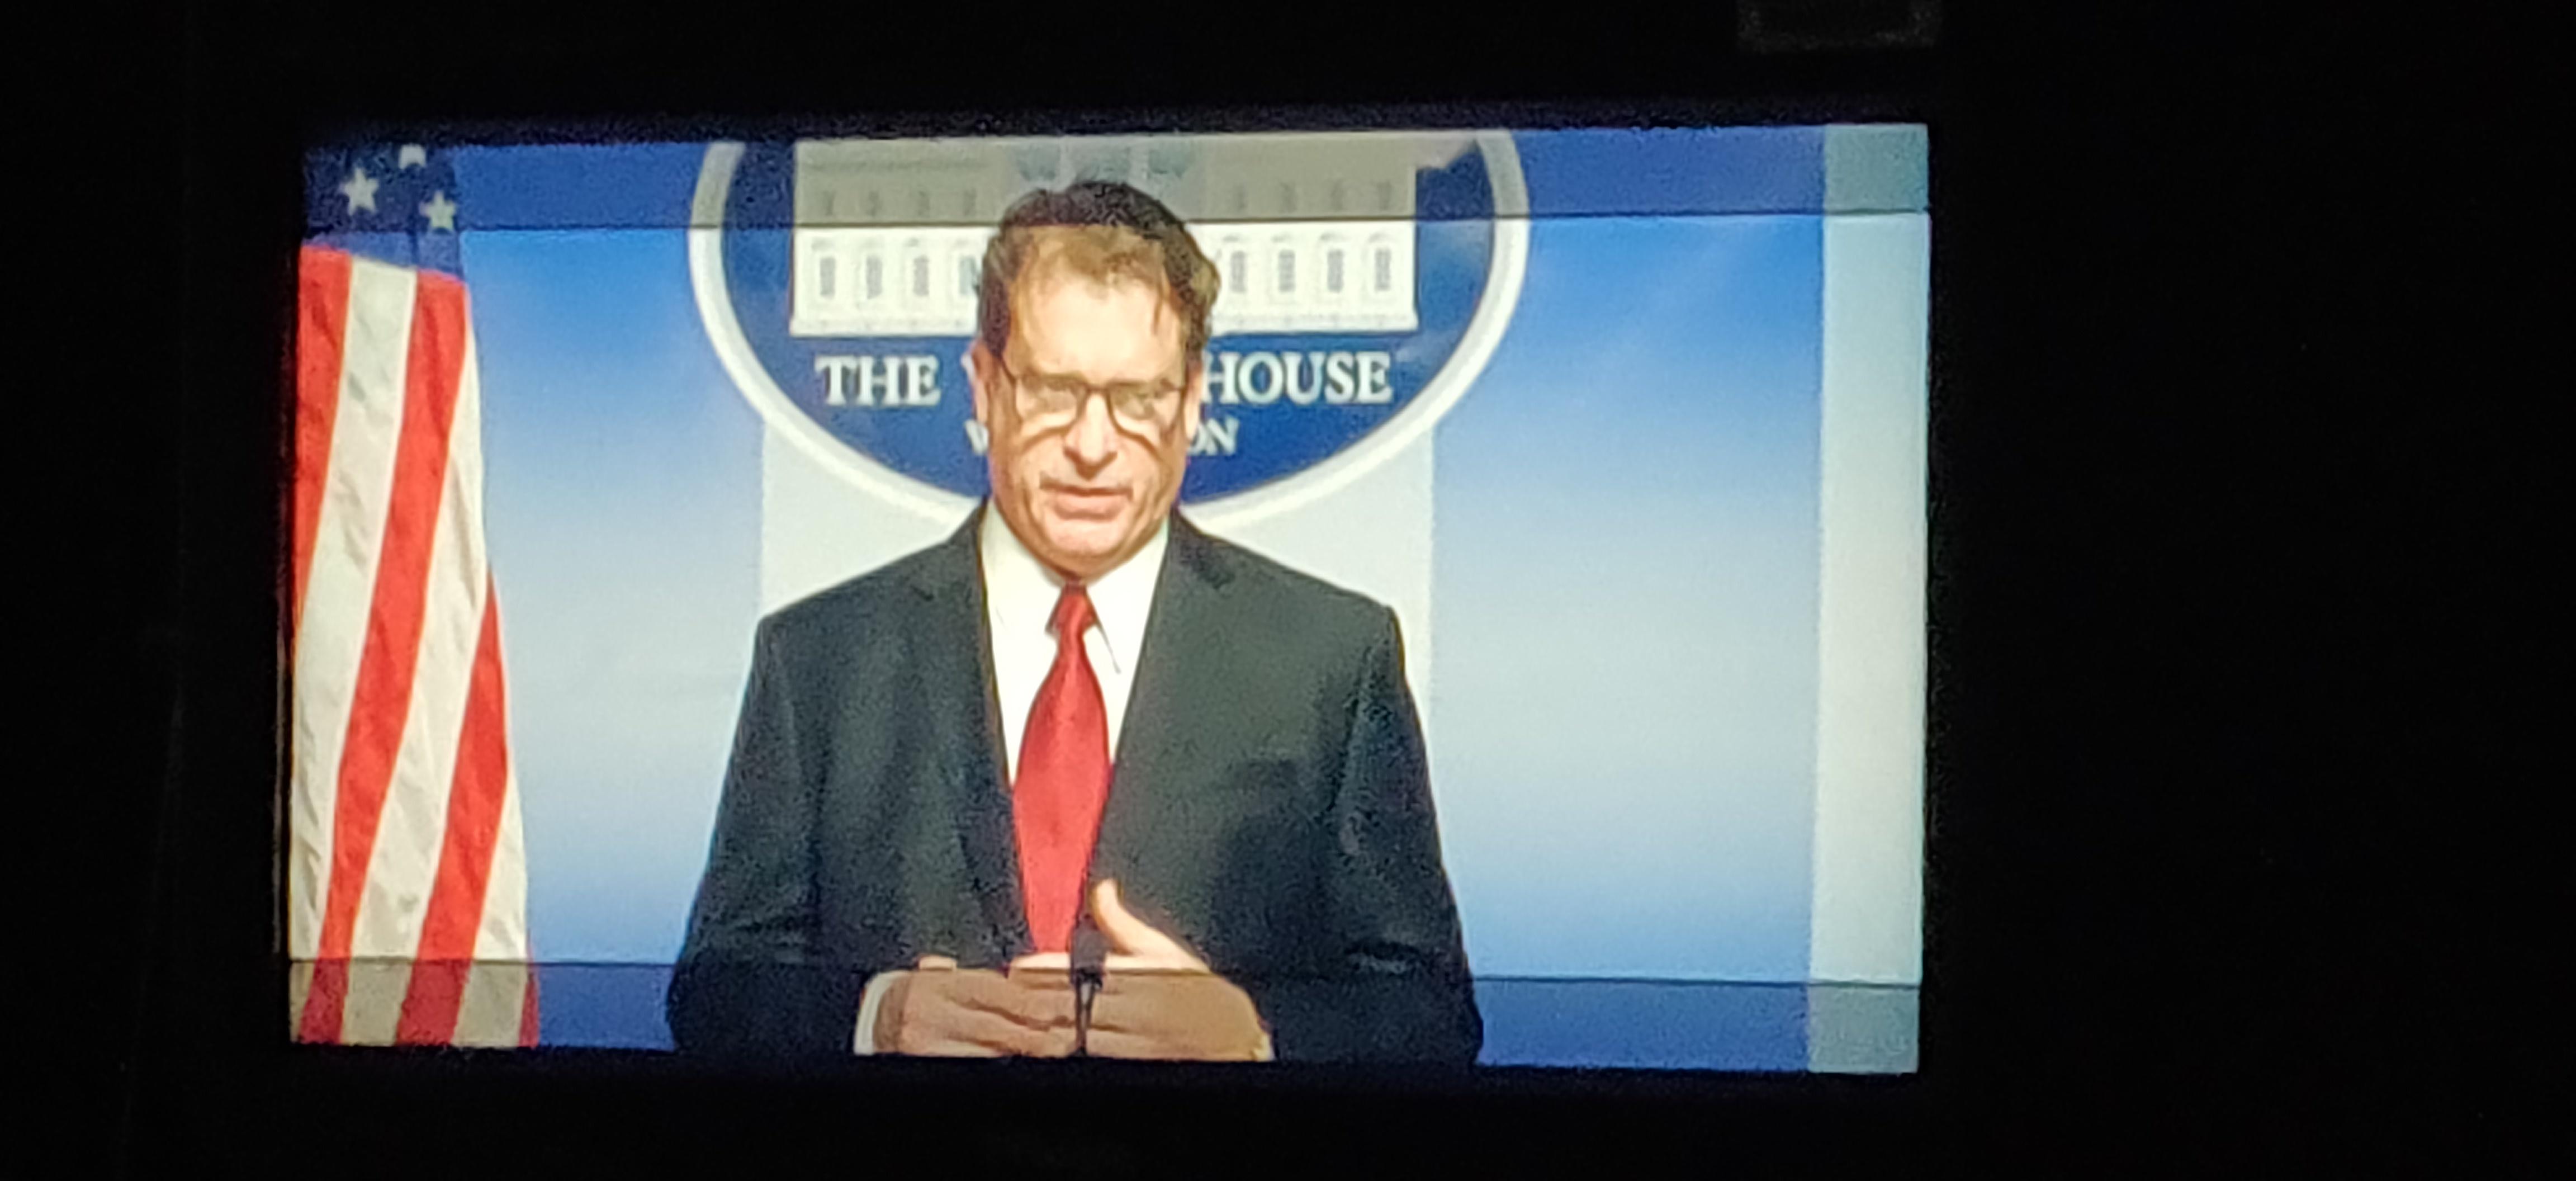 White house press briefing set